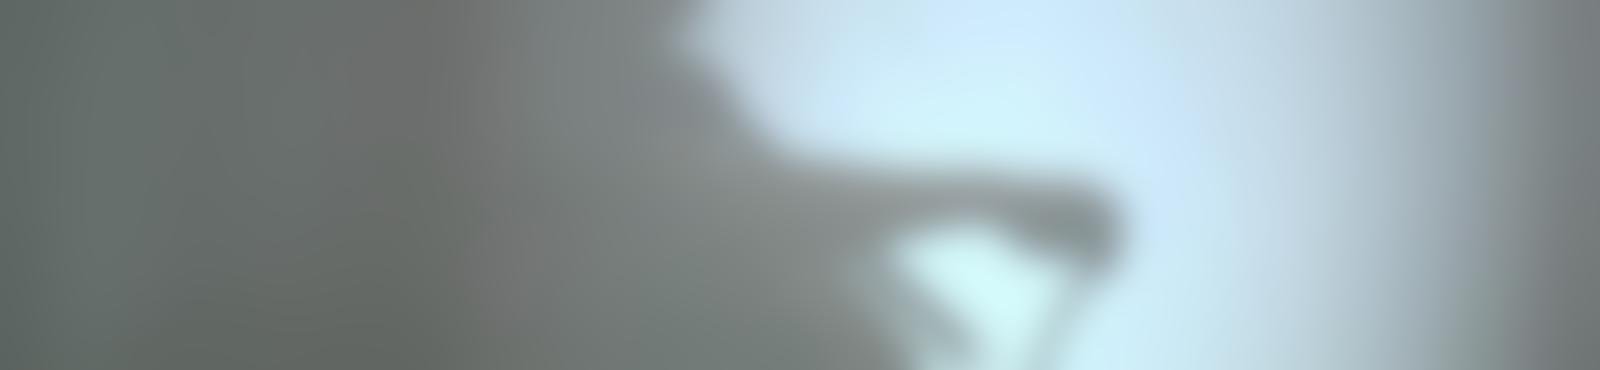 Blurred ef1ace0b 2993 43bf b85f bf96dca3b330